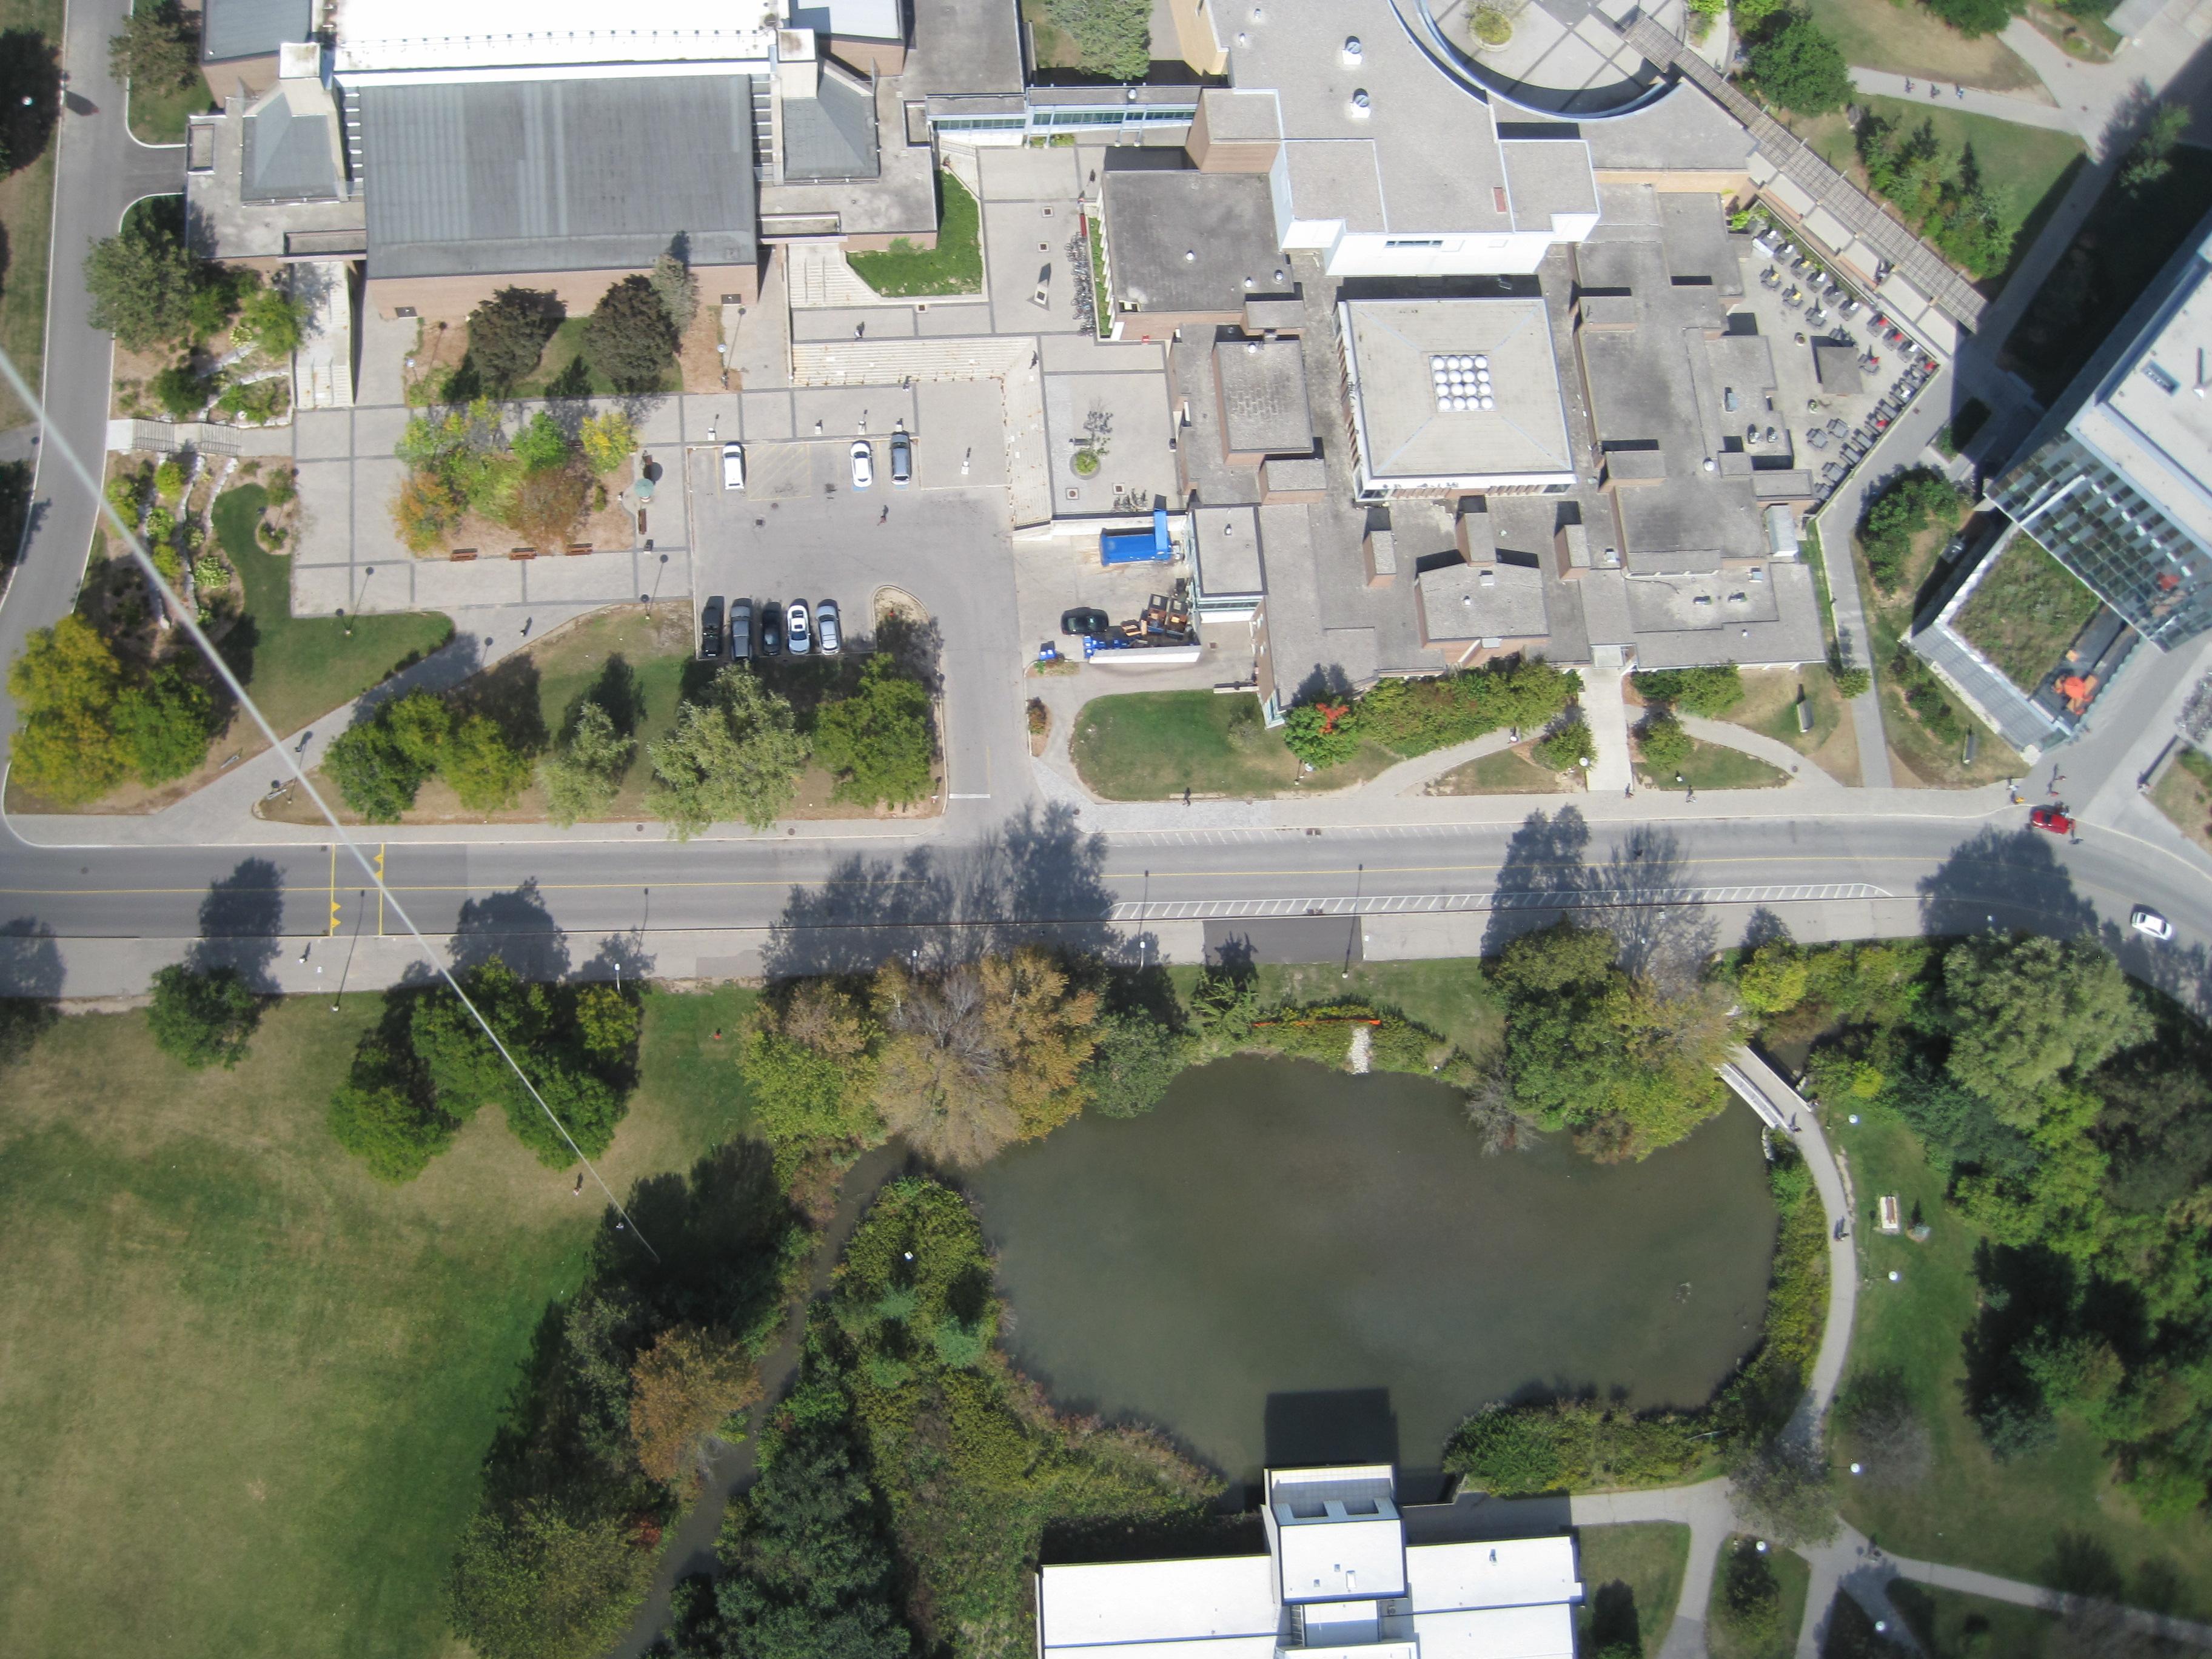 Uwaterloo campus V1 green